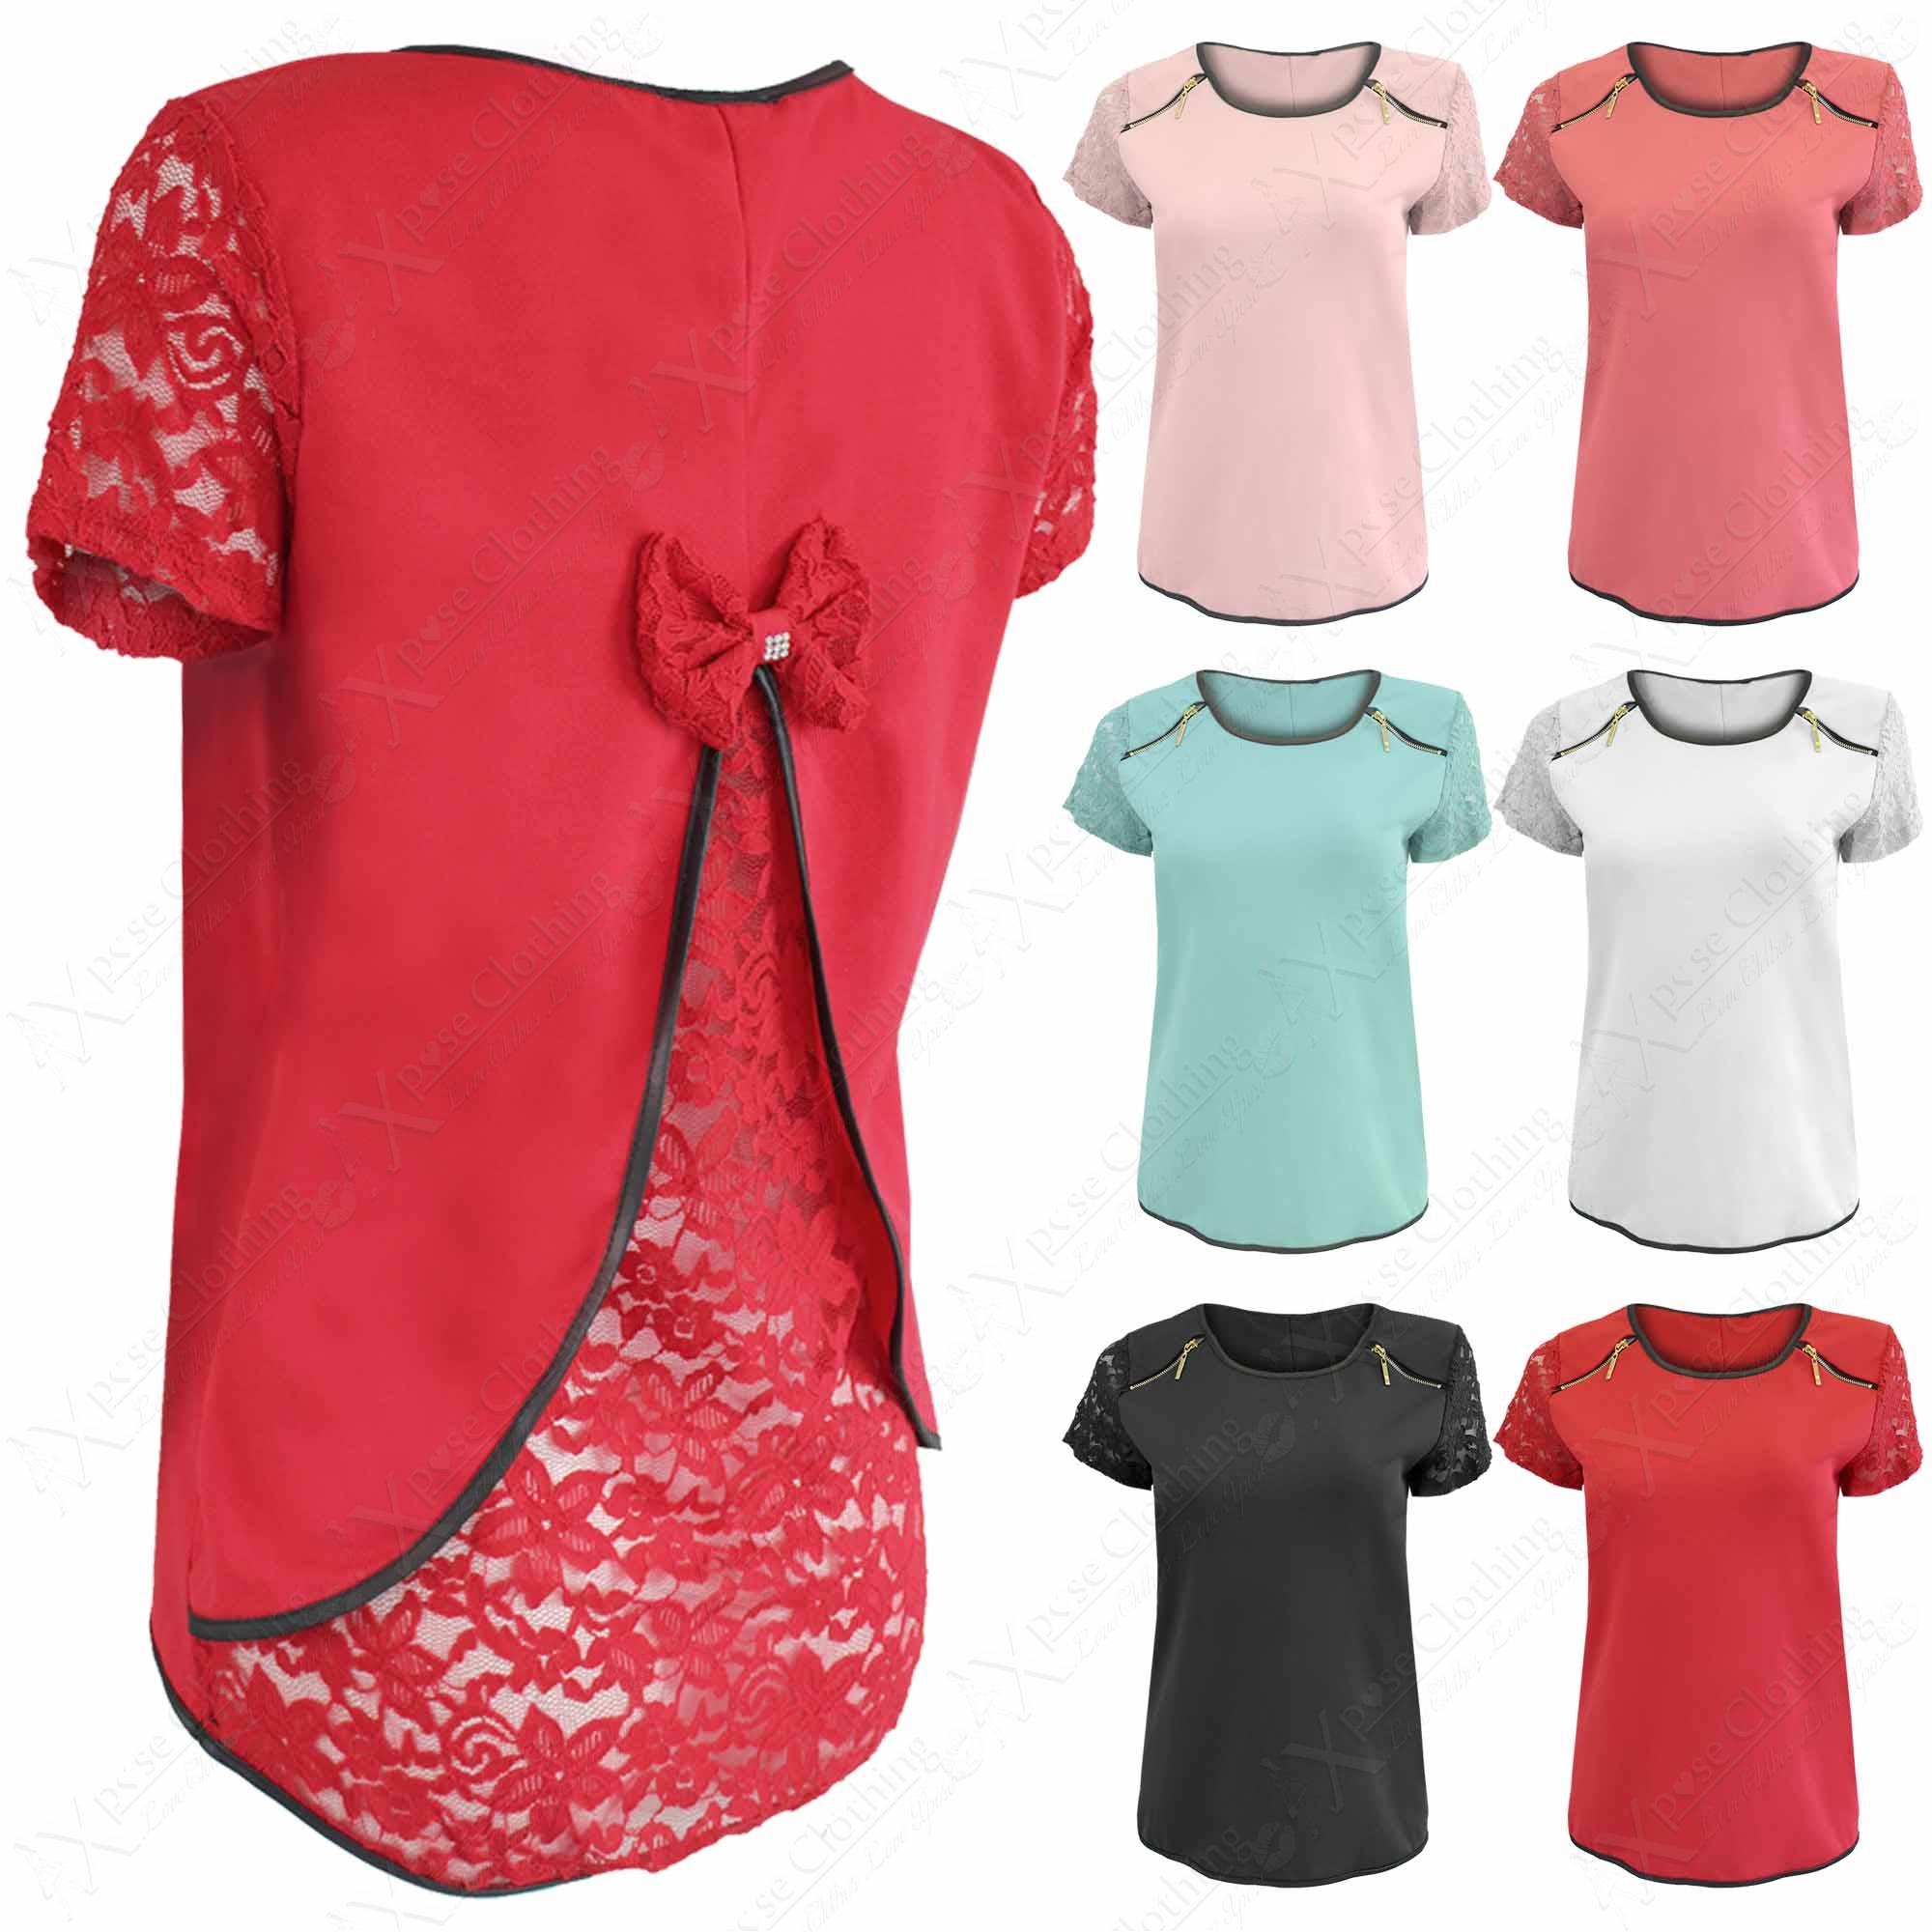 Stylish chiffon dresses for ladies by feel strawberry